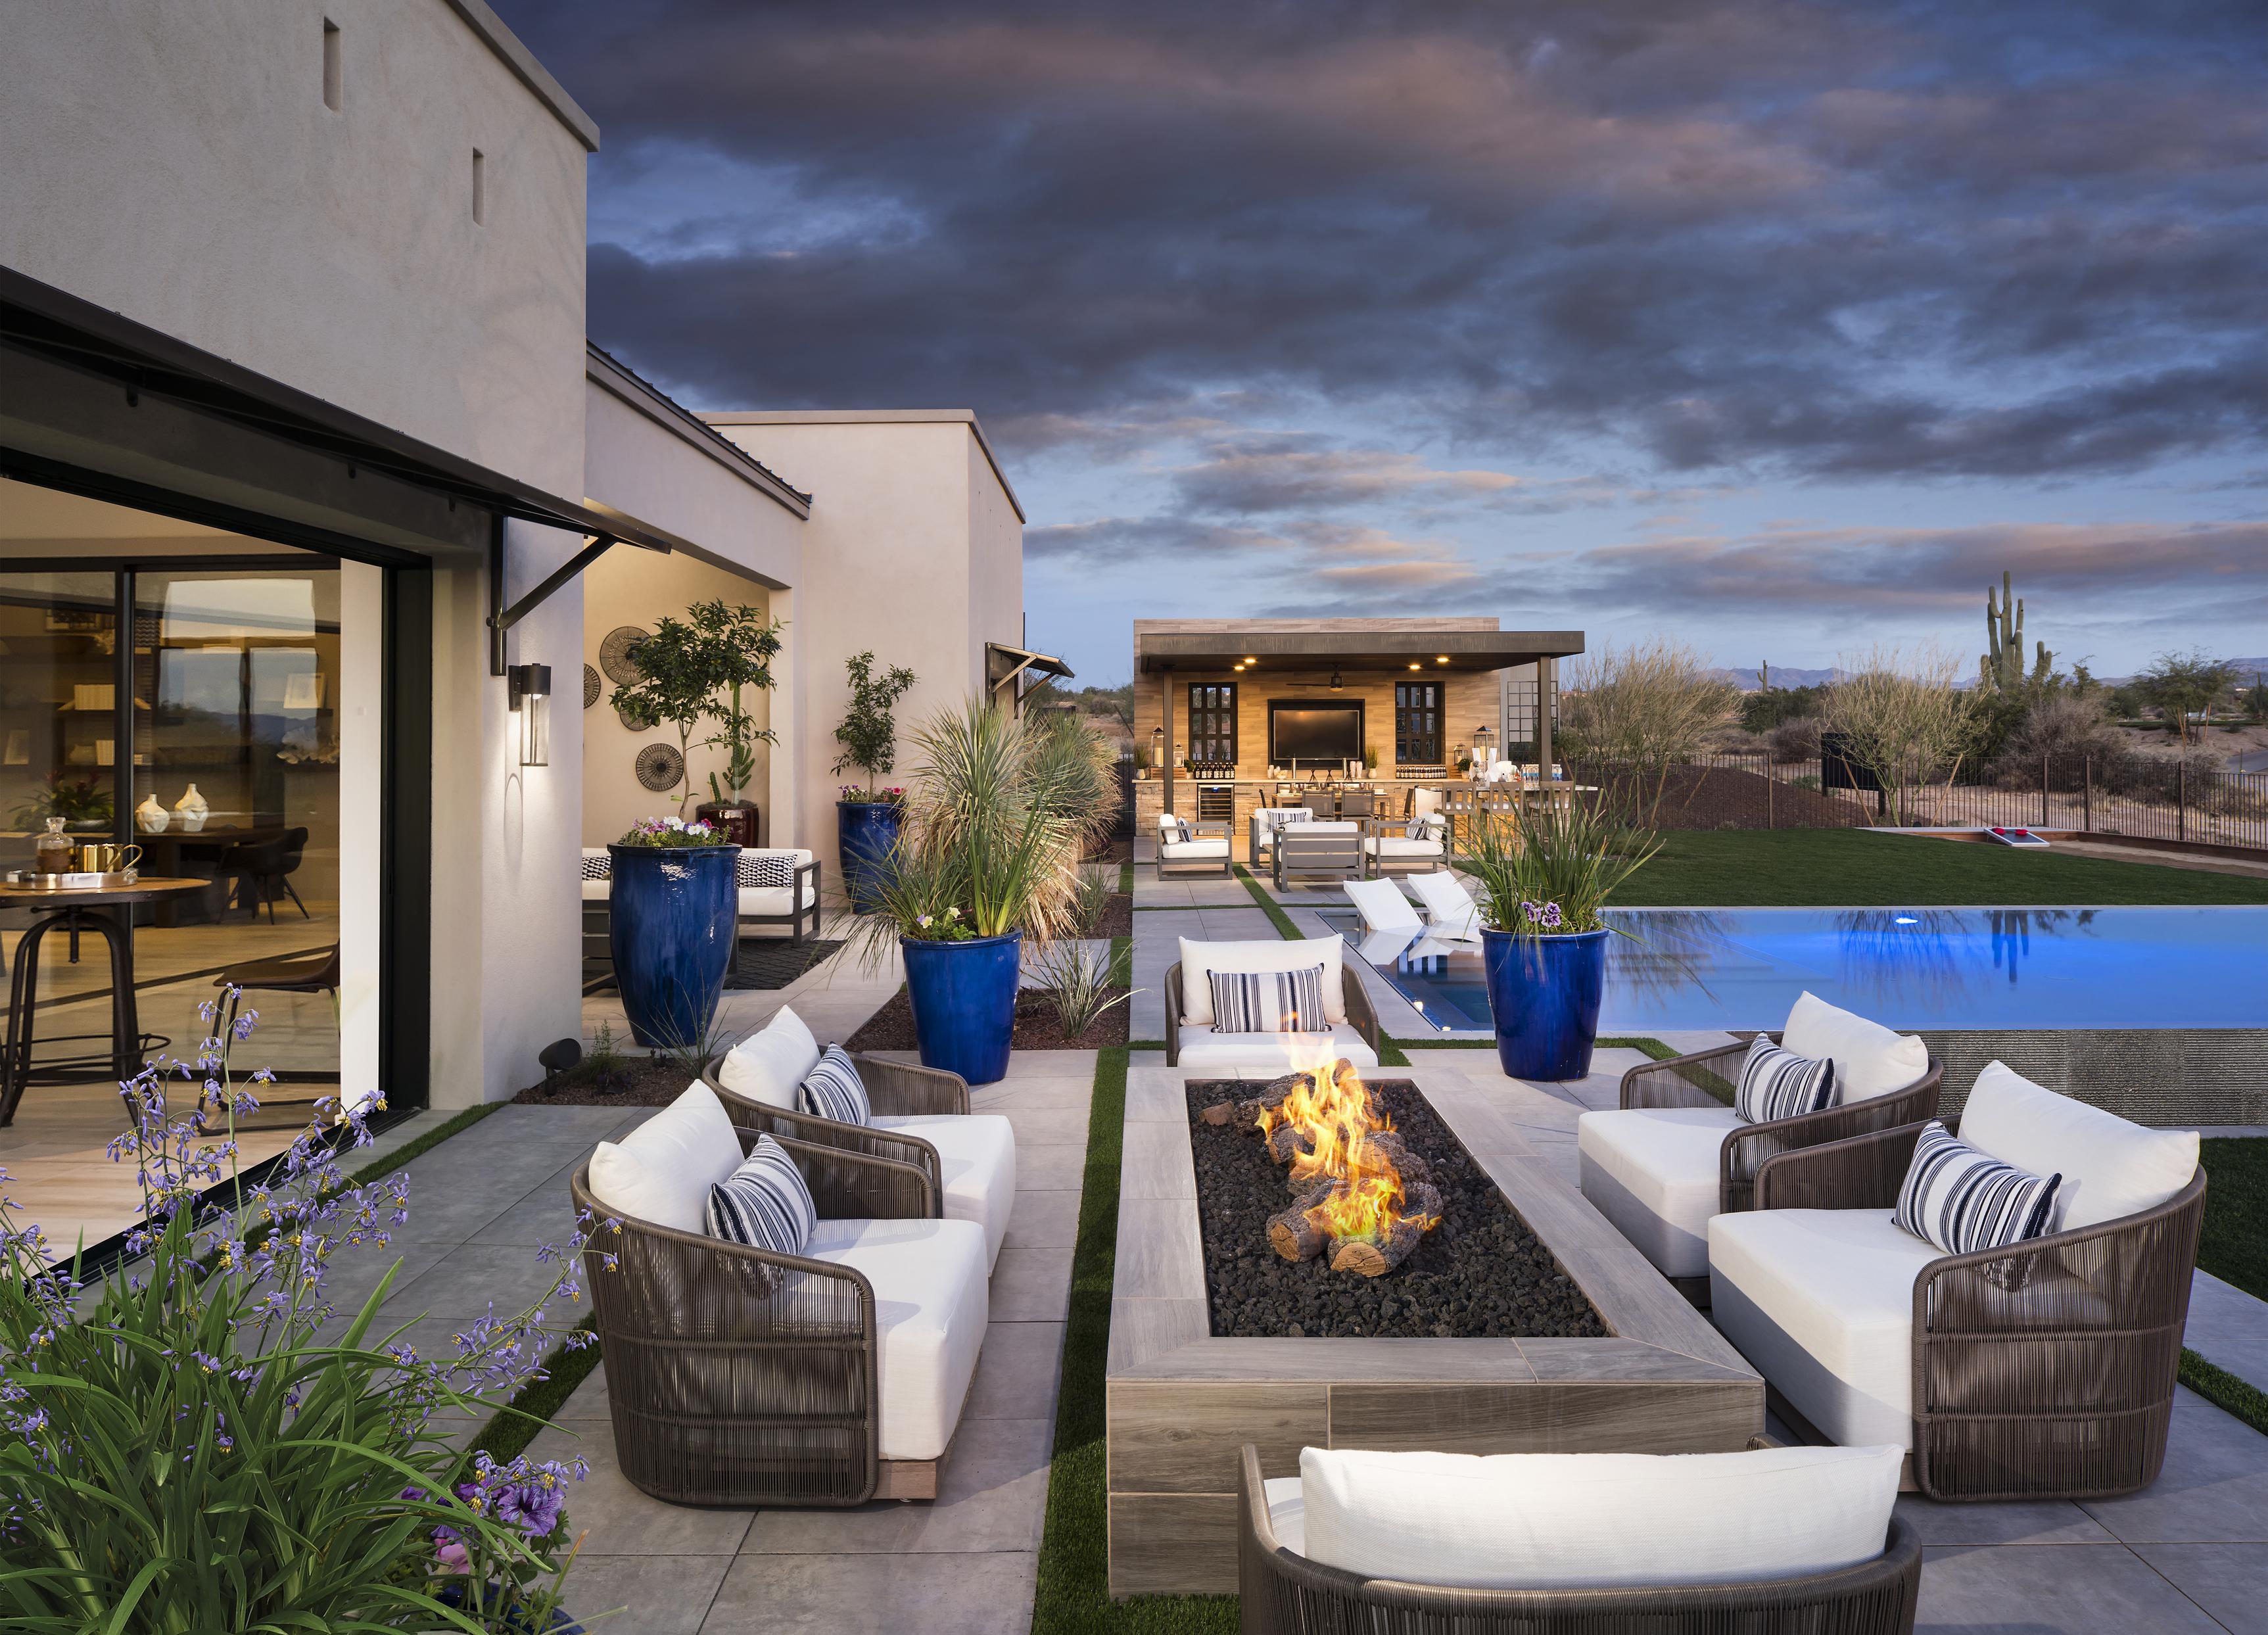 Small Backyard Landscaping Designs & Ideas | Build Beautiful on Open Backyard Ideas id=32108